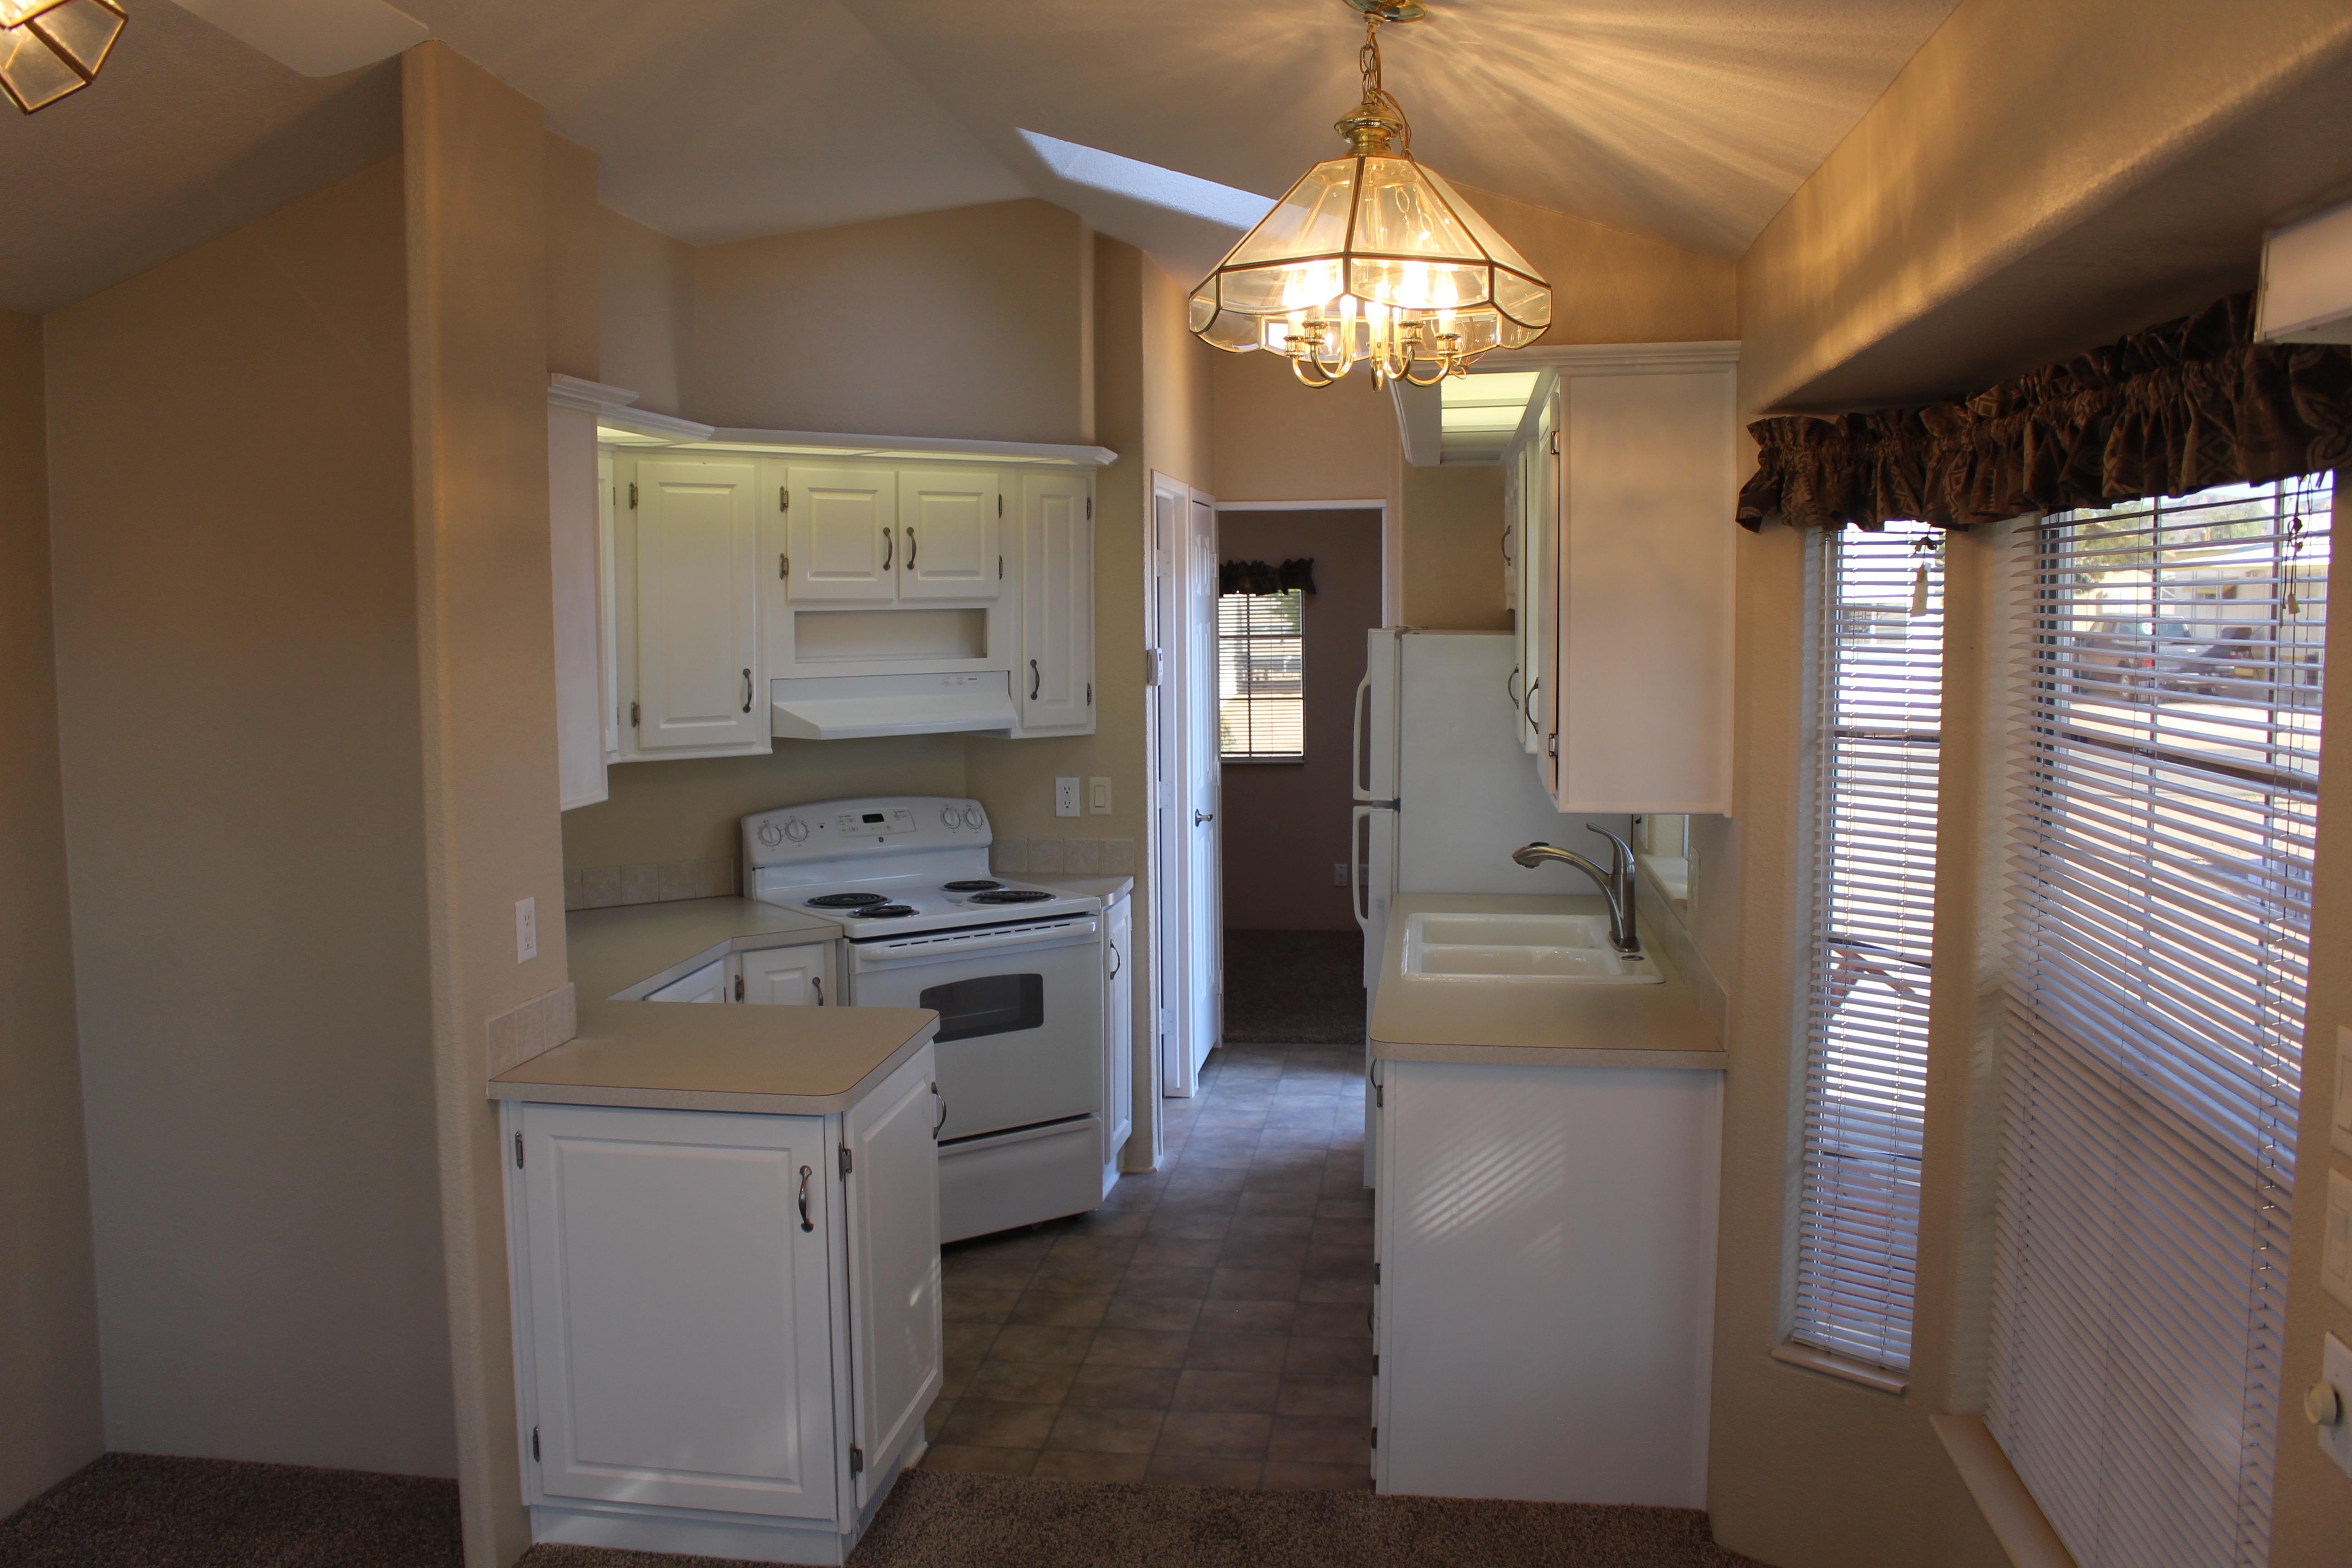 Oasis Junction Mobile Home RV Park Apache AZ 85120